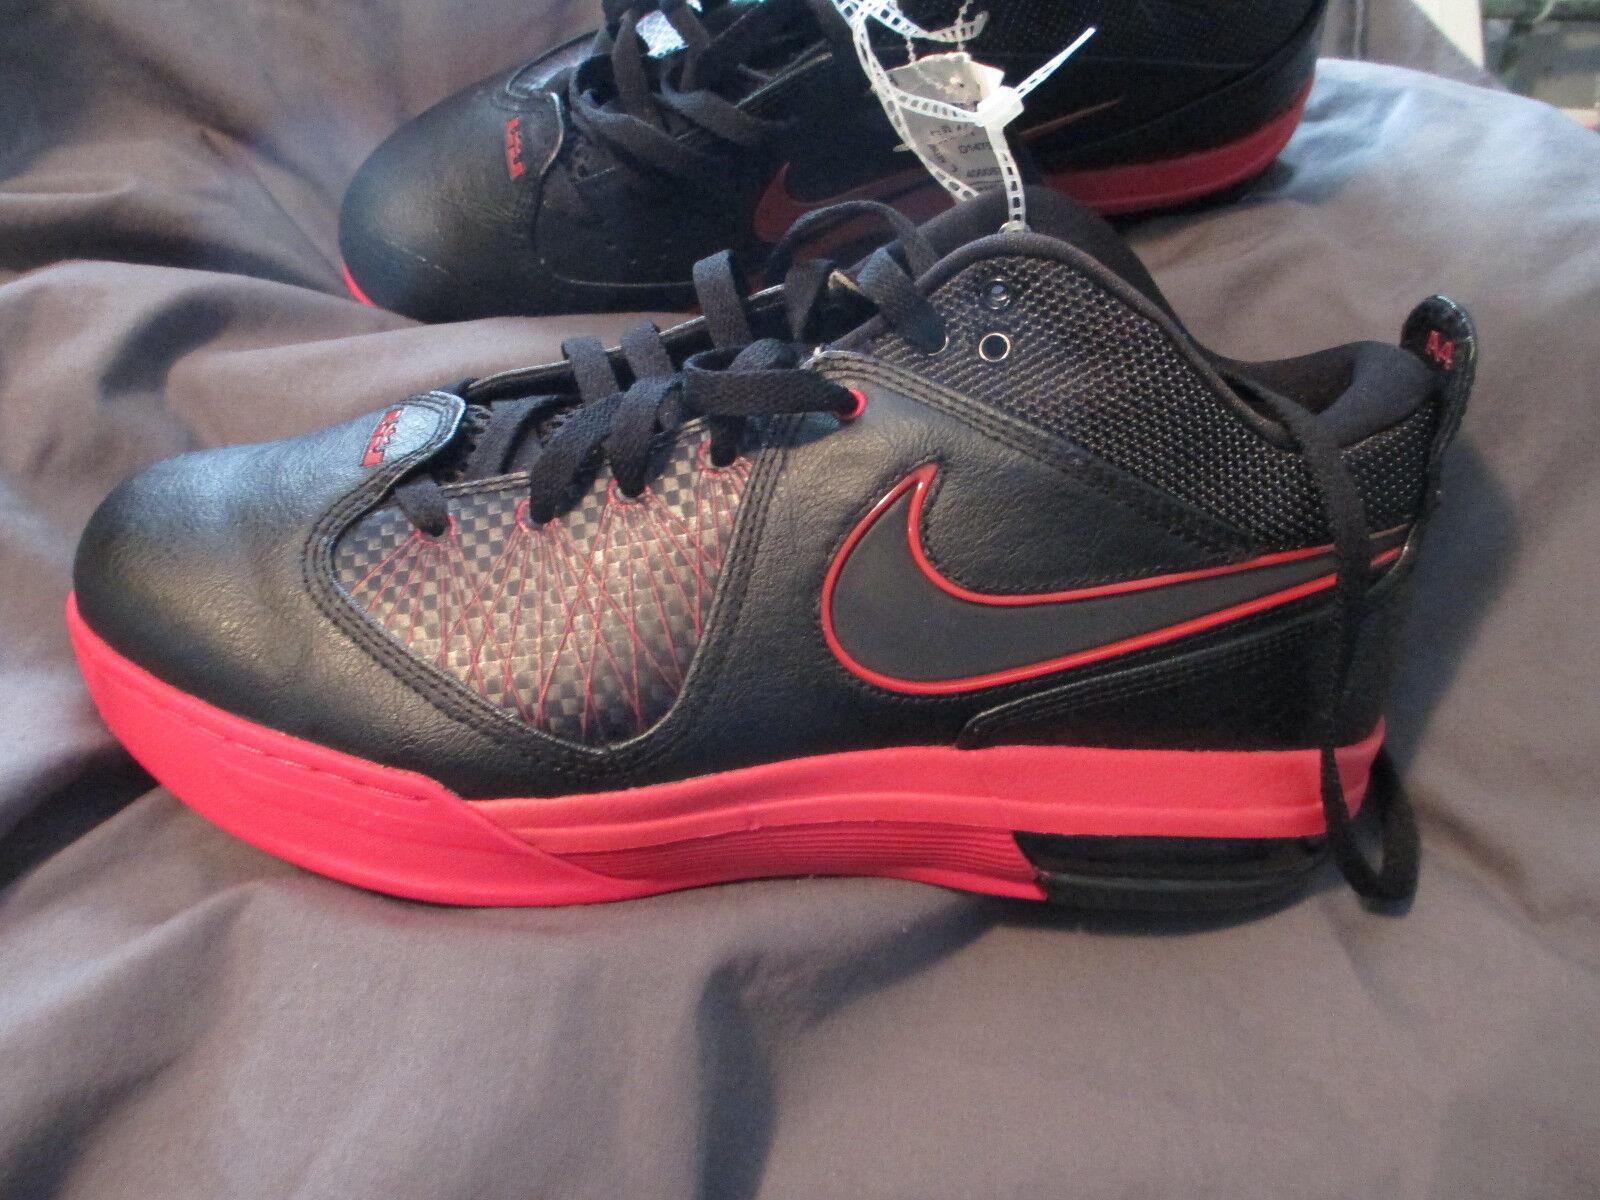 Nike Air Max AMBASSADOR IV size 11,black w/red